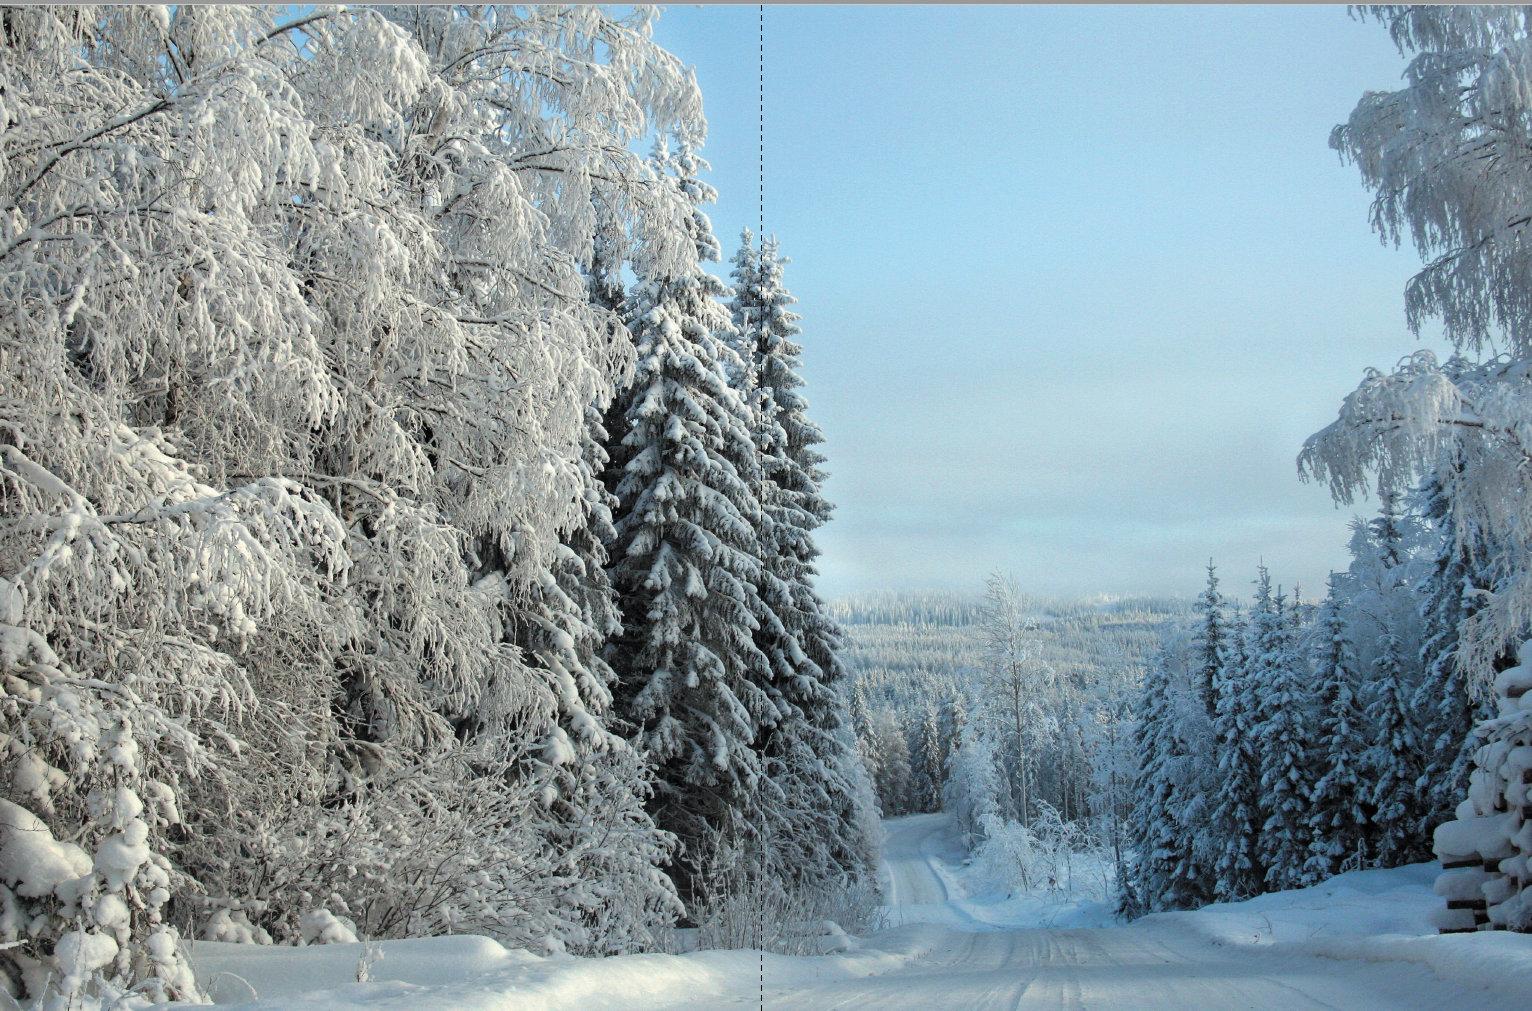 Pohjois-Karjala maisema